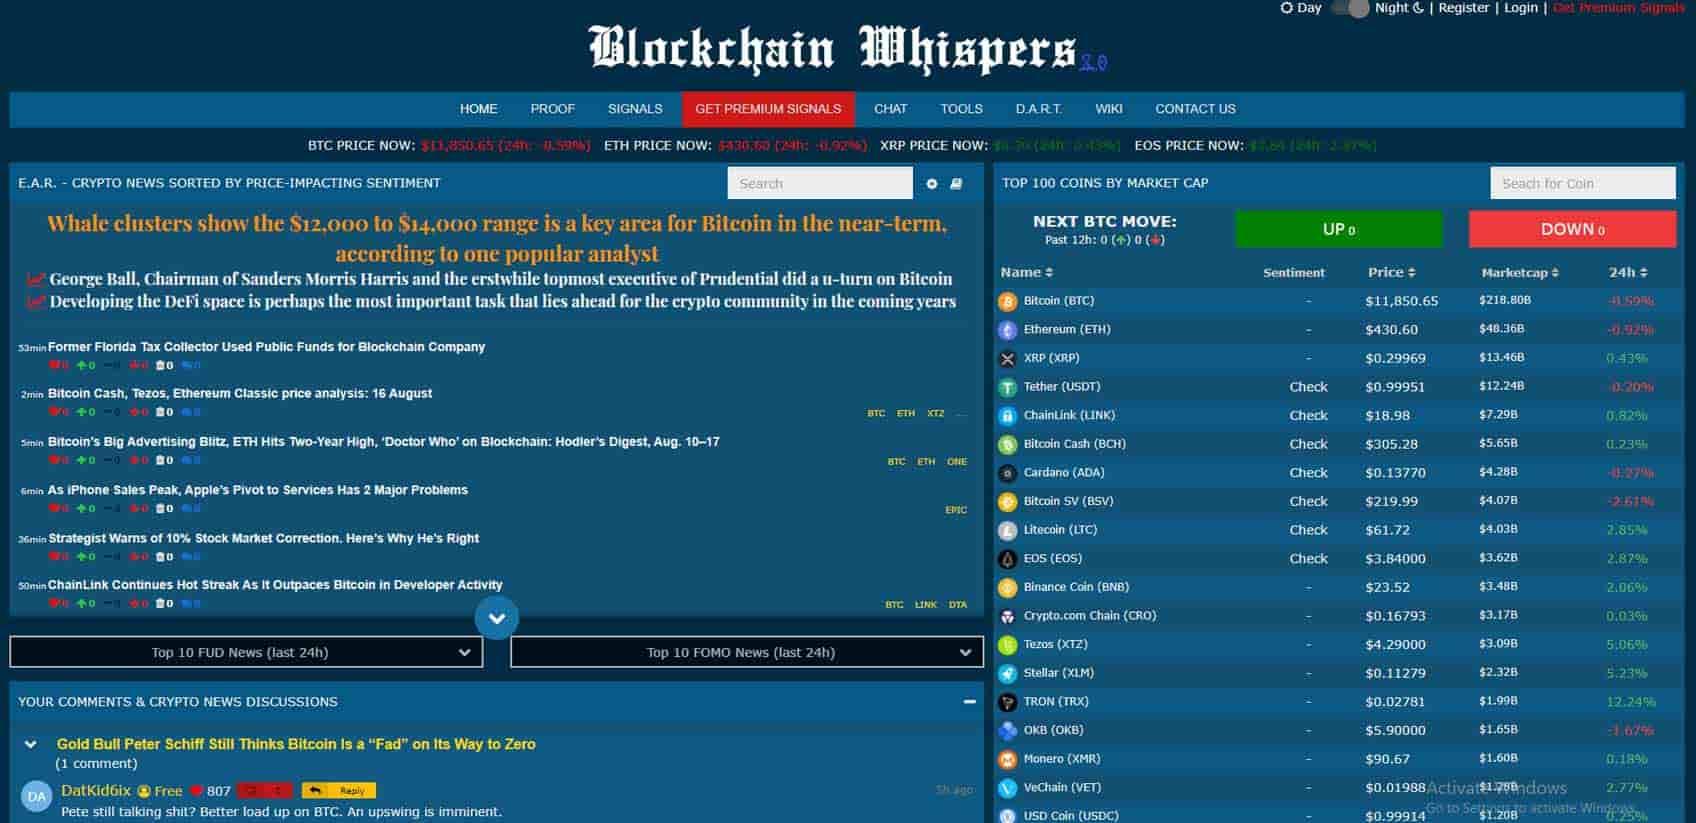 blockchain whispers